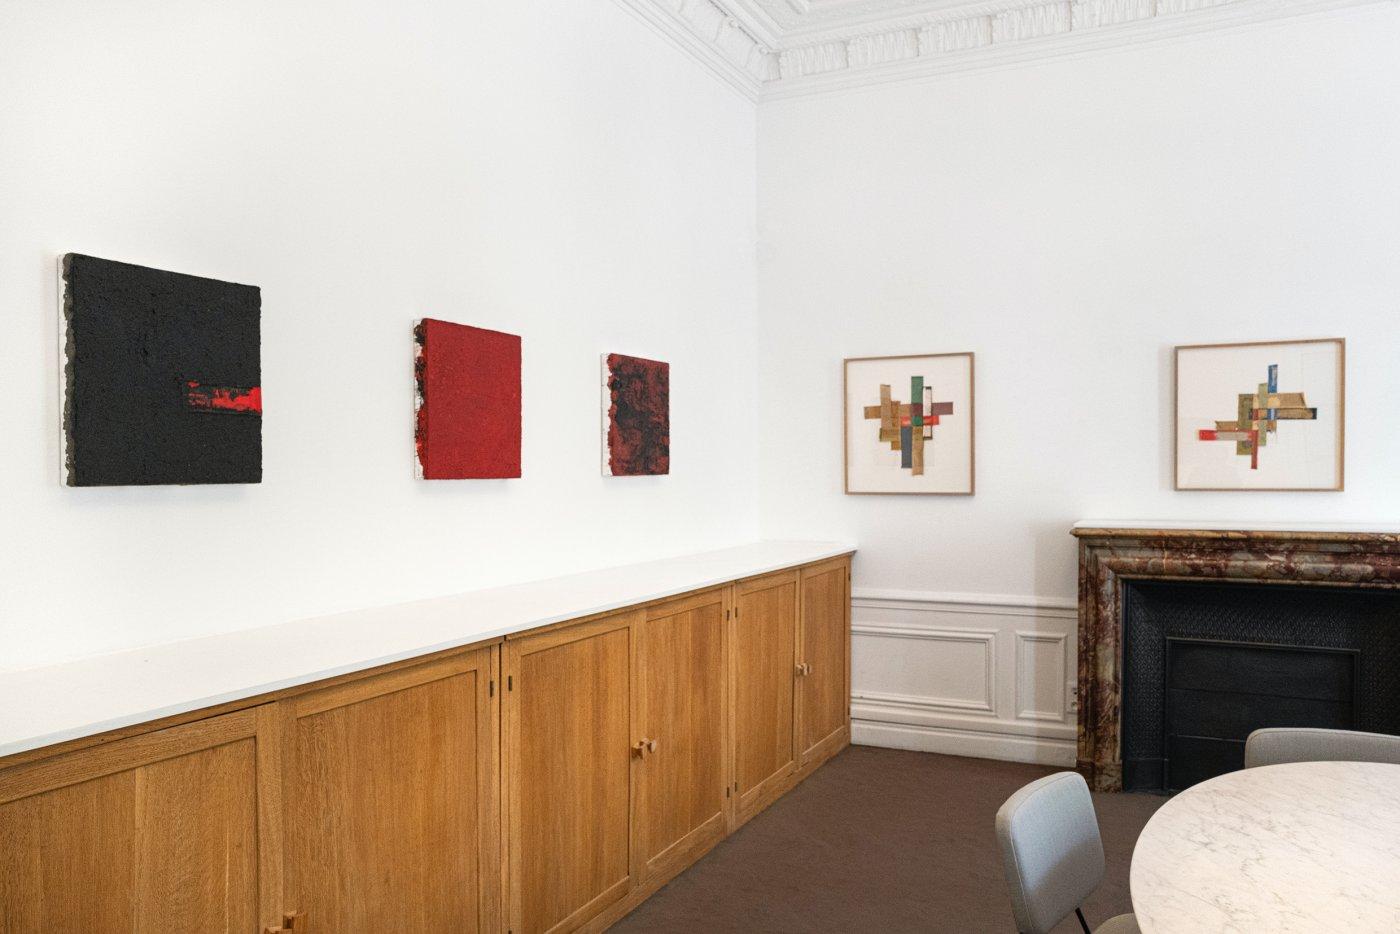 Galerie Lelong Co Samuel Levi Jones 2